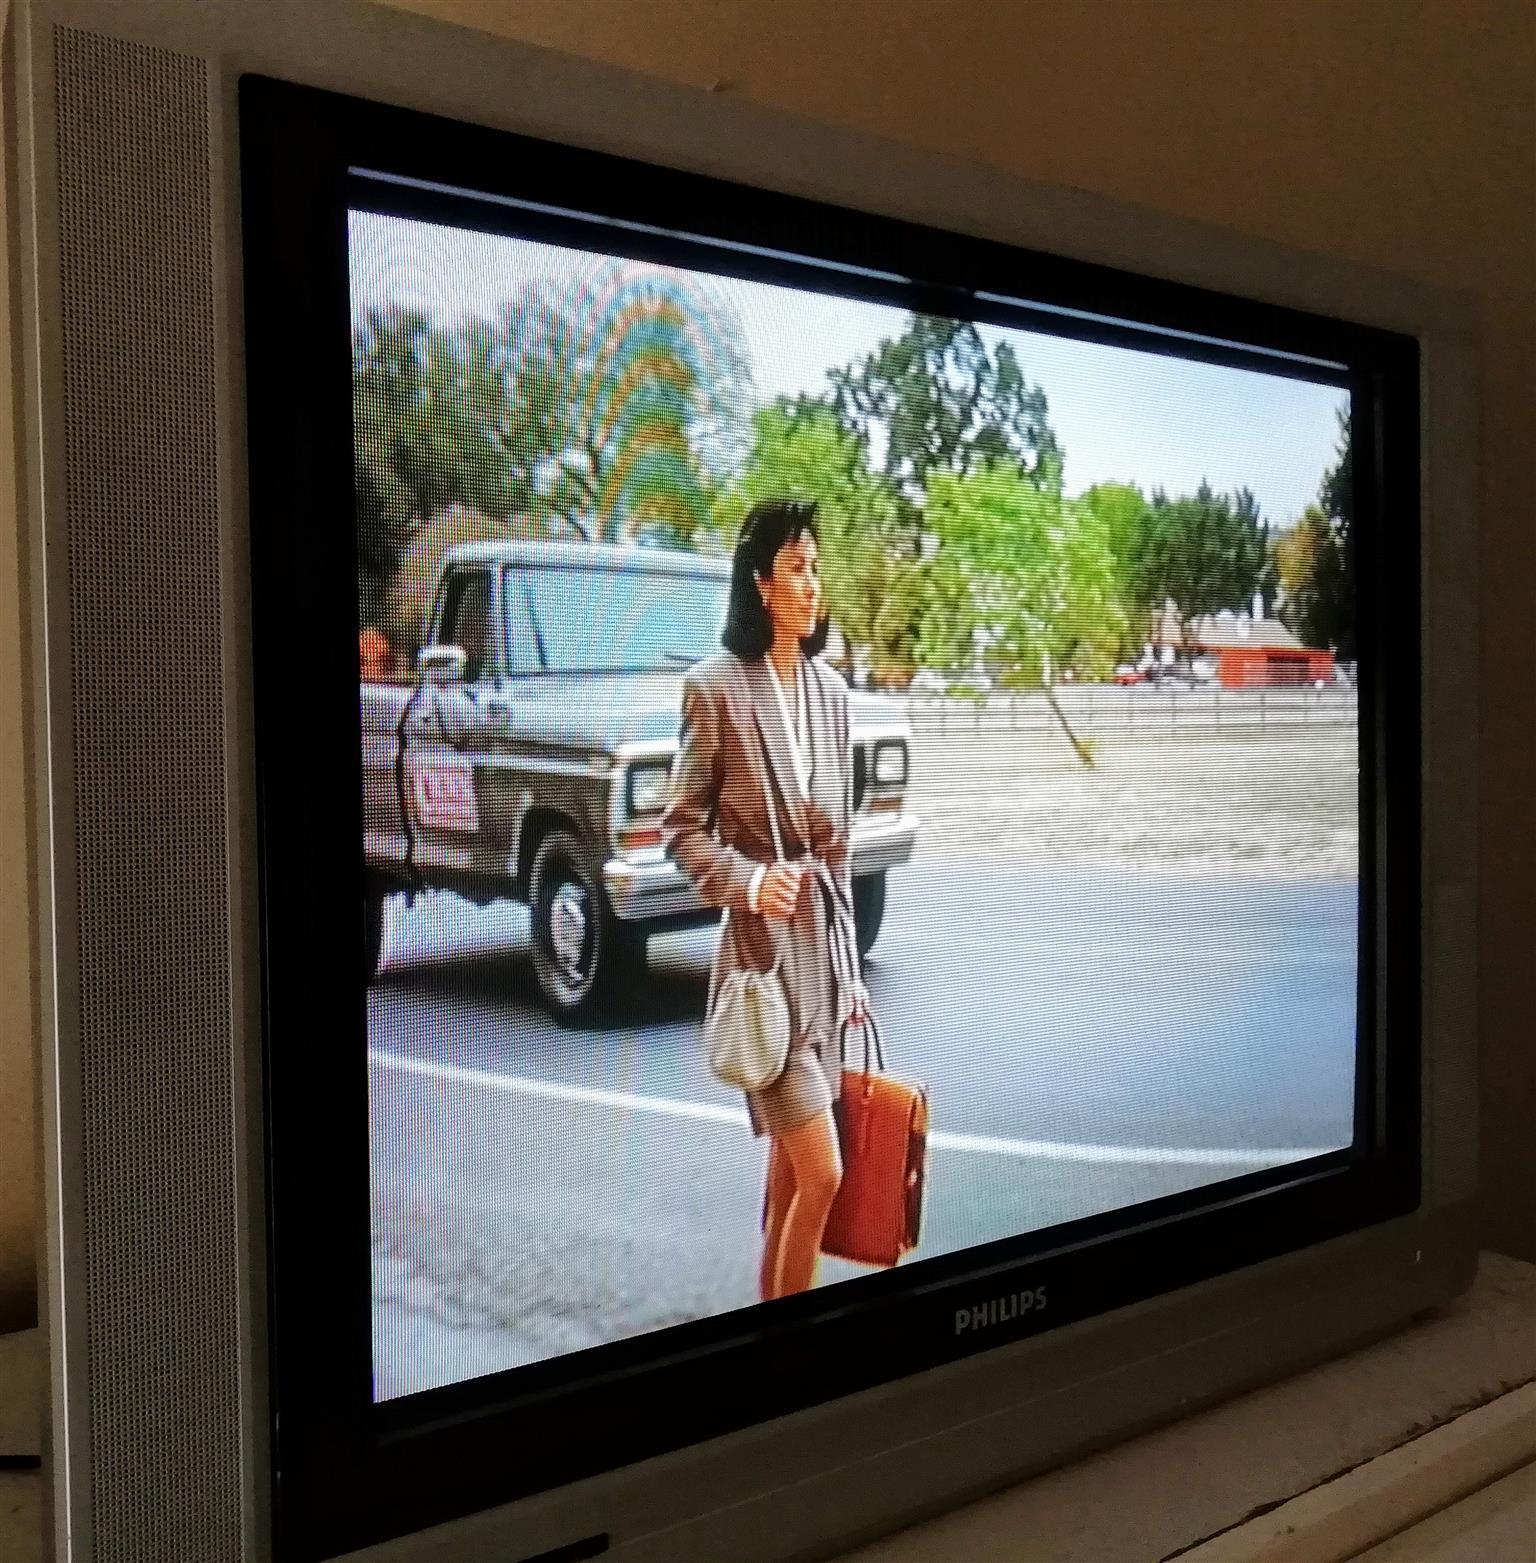 74 cm Philips flat tube box type tv